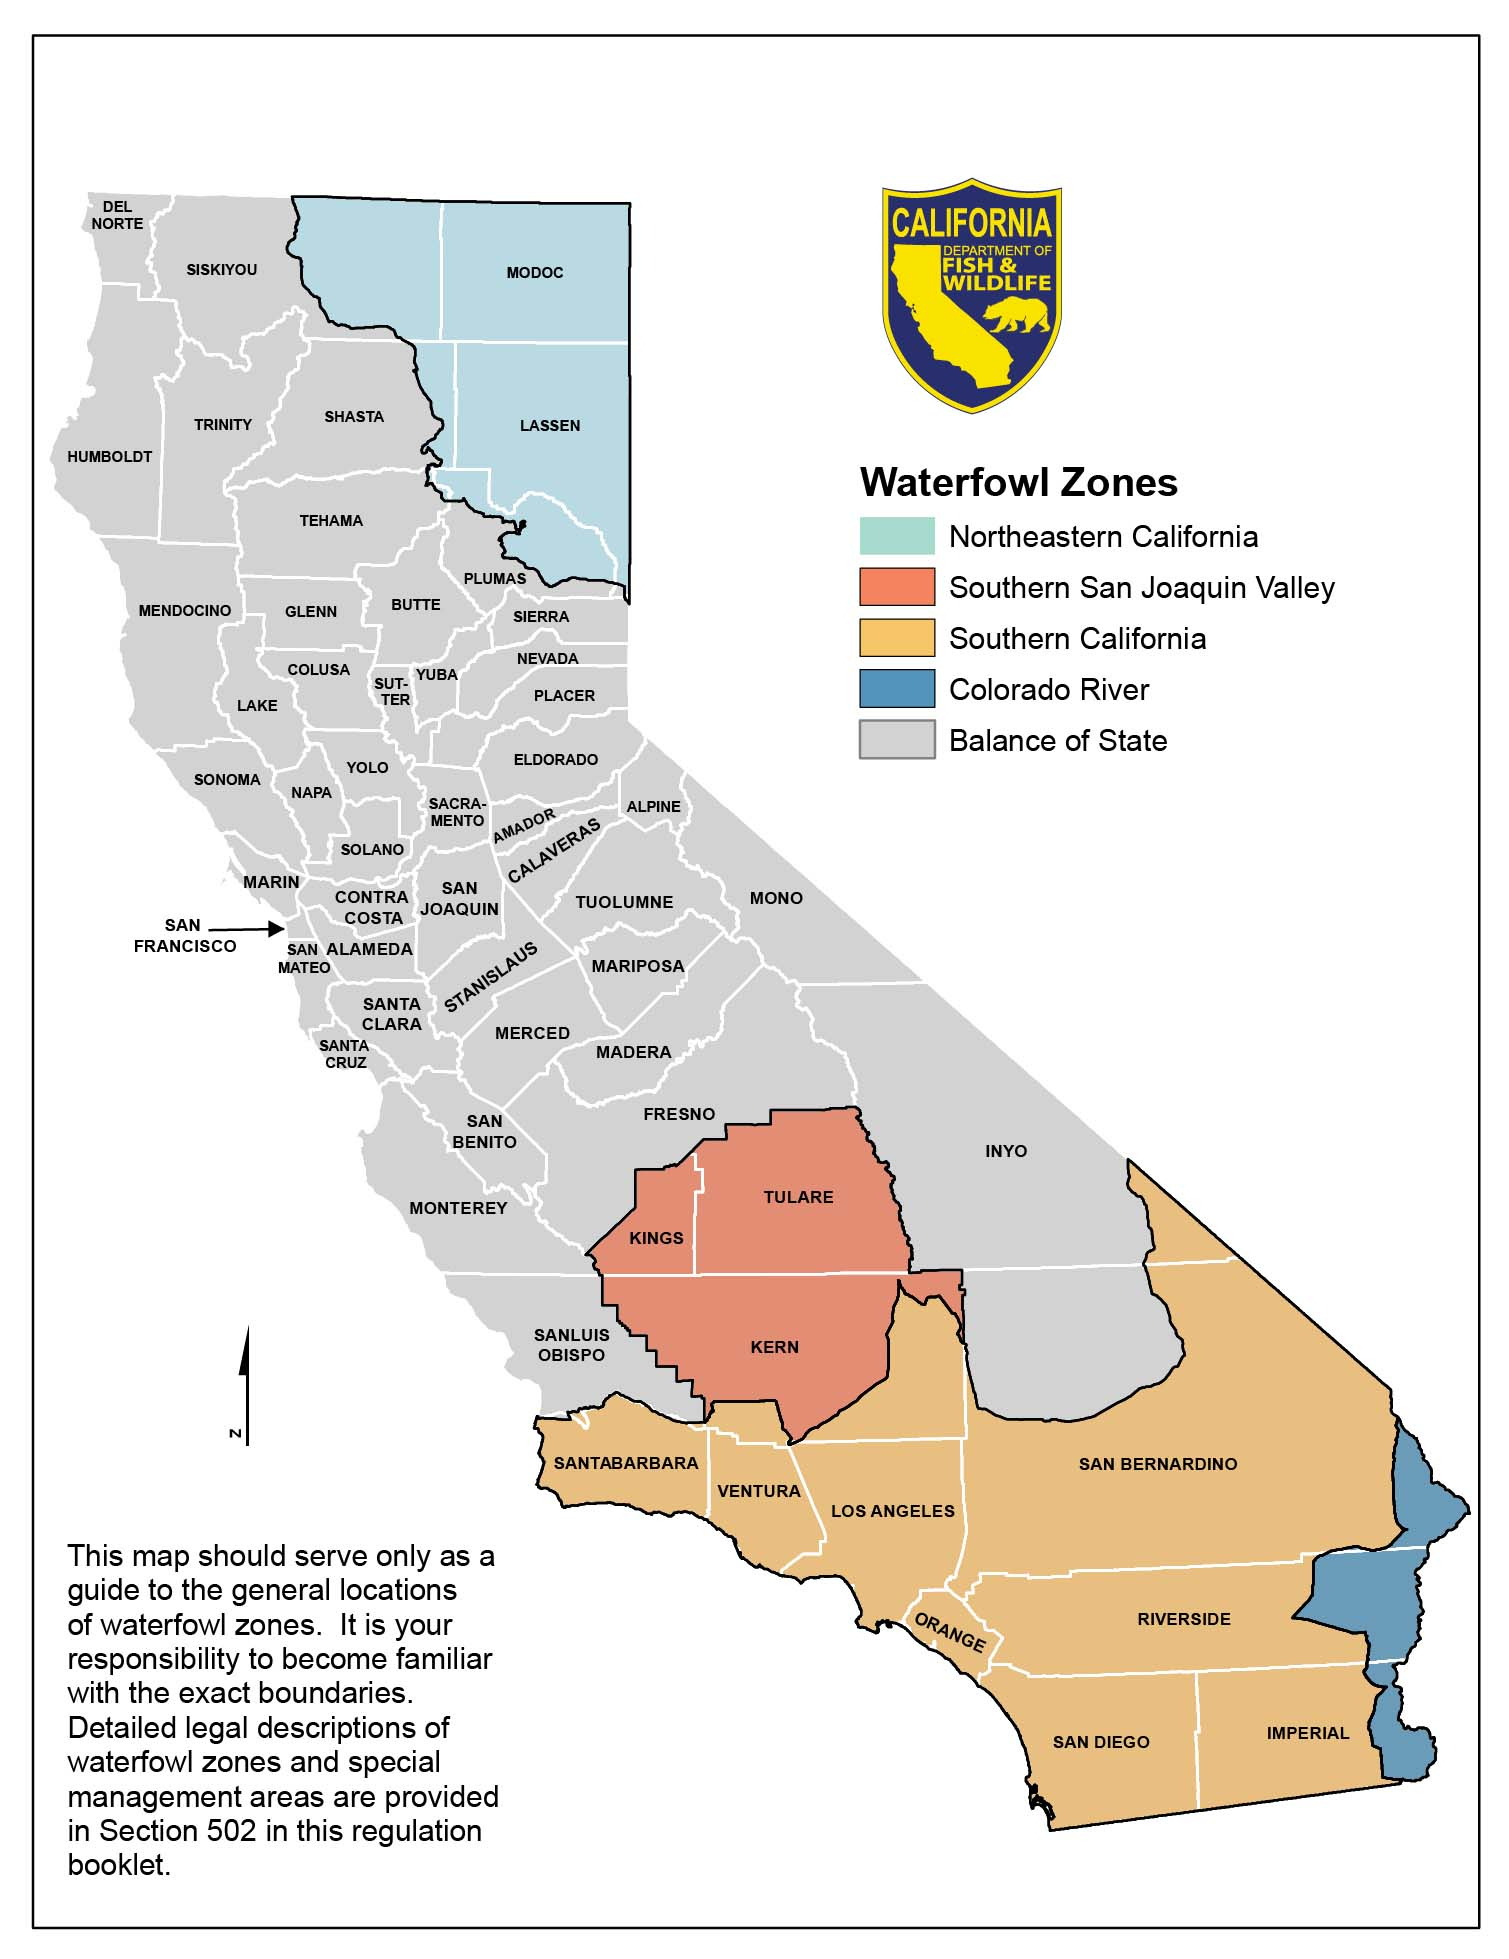 Season Dates And Bag Limits - California Waterfowl Association - California Deer Zone Map 2018